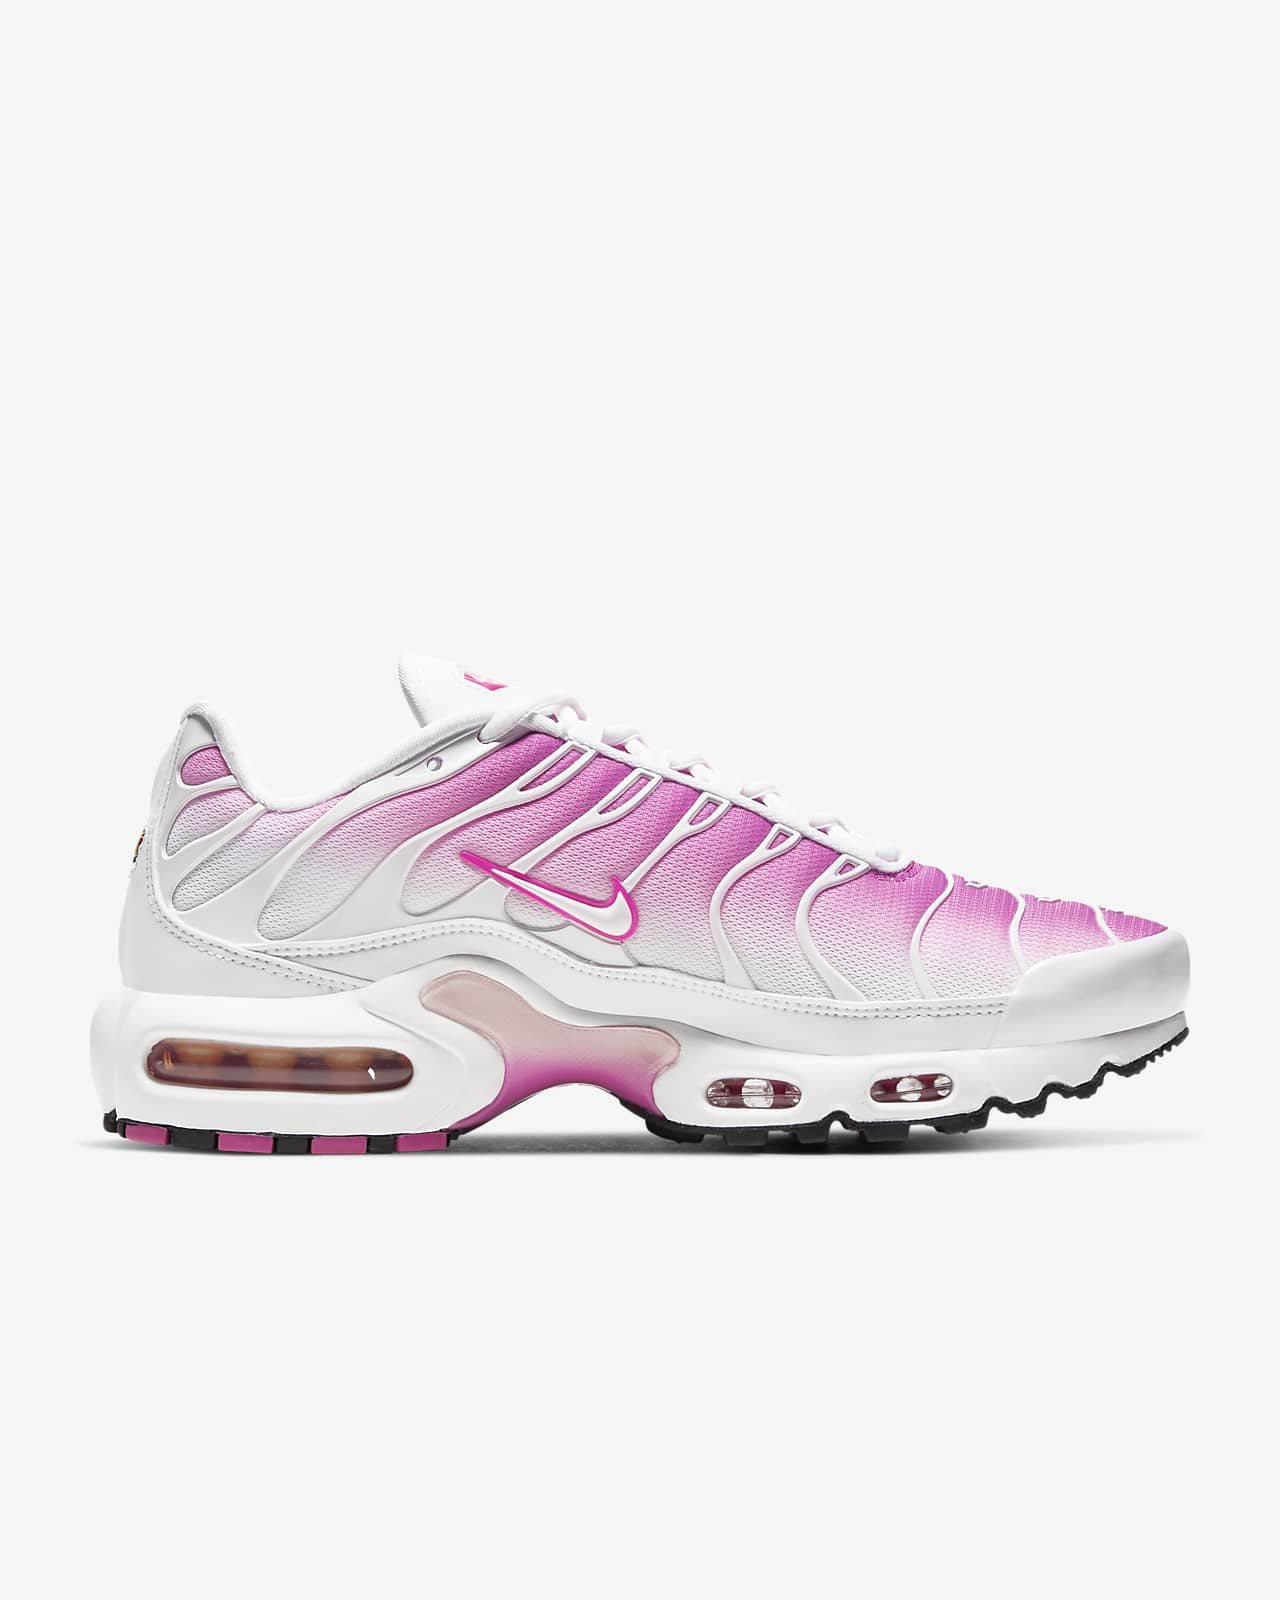 Nike Air Max Plus Womens : Nike Shoes for Women,Men & Kids